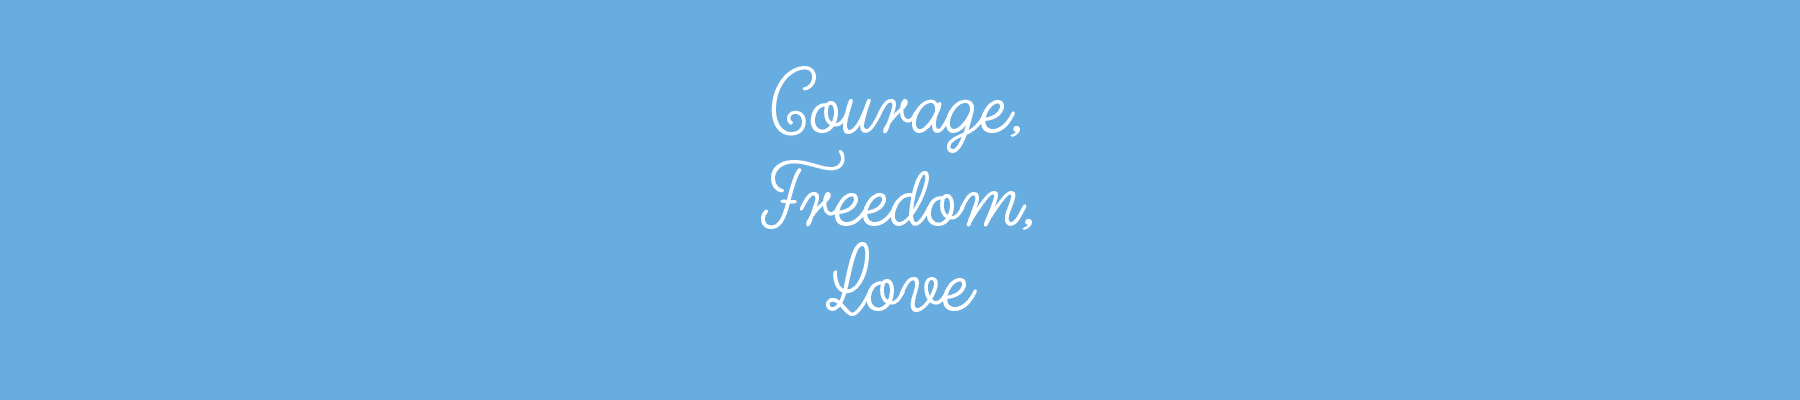 Courage, Freedom, Love